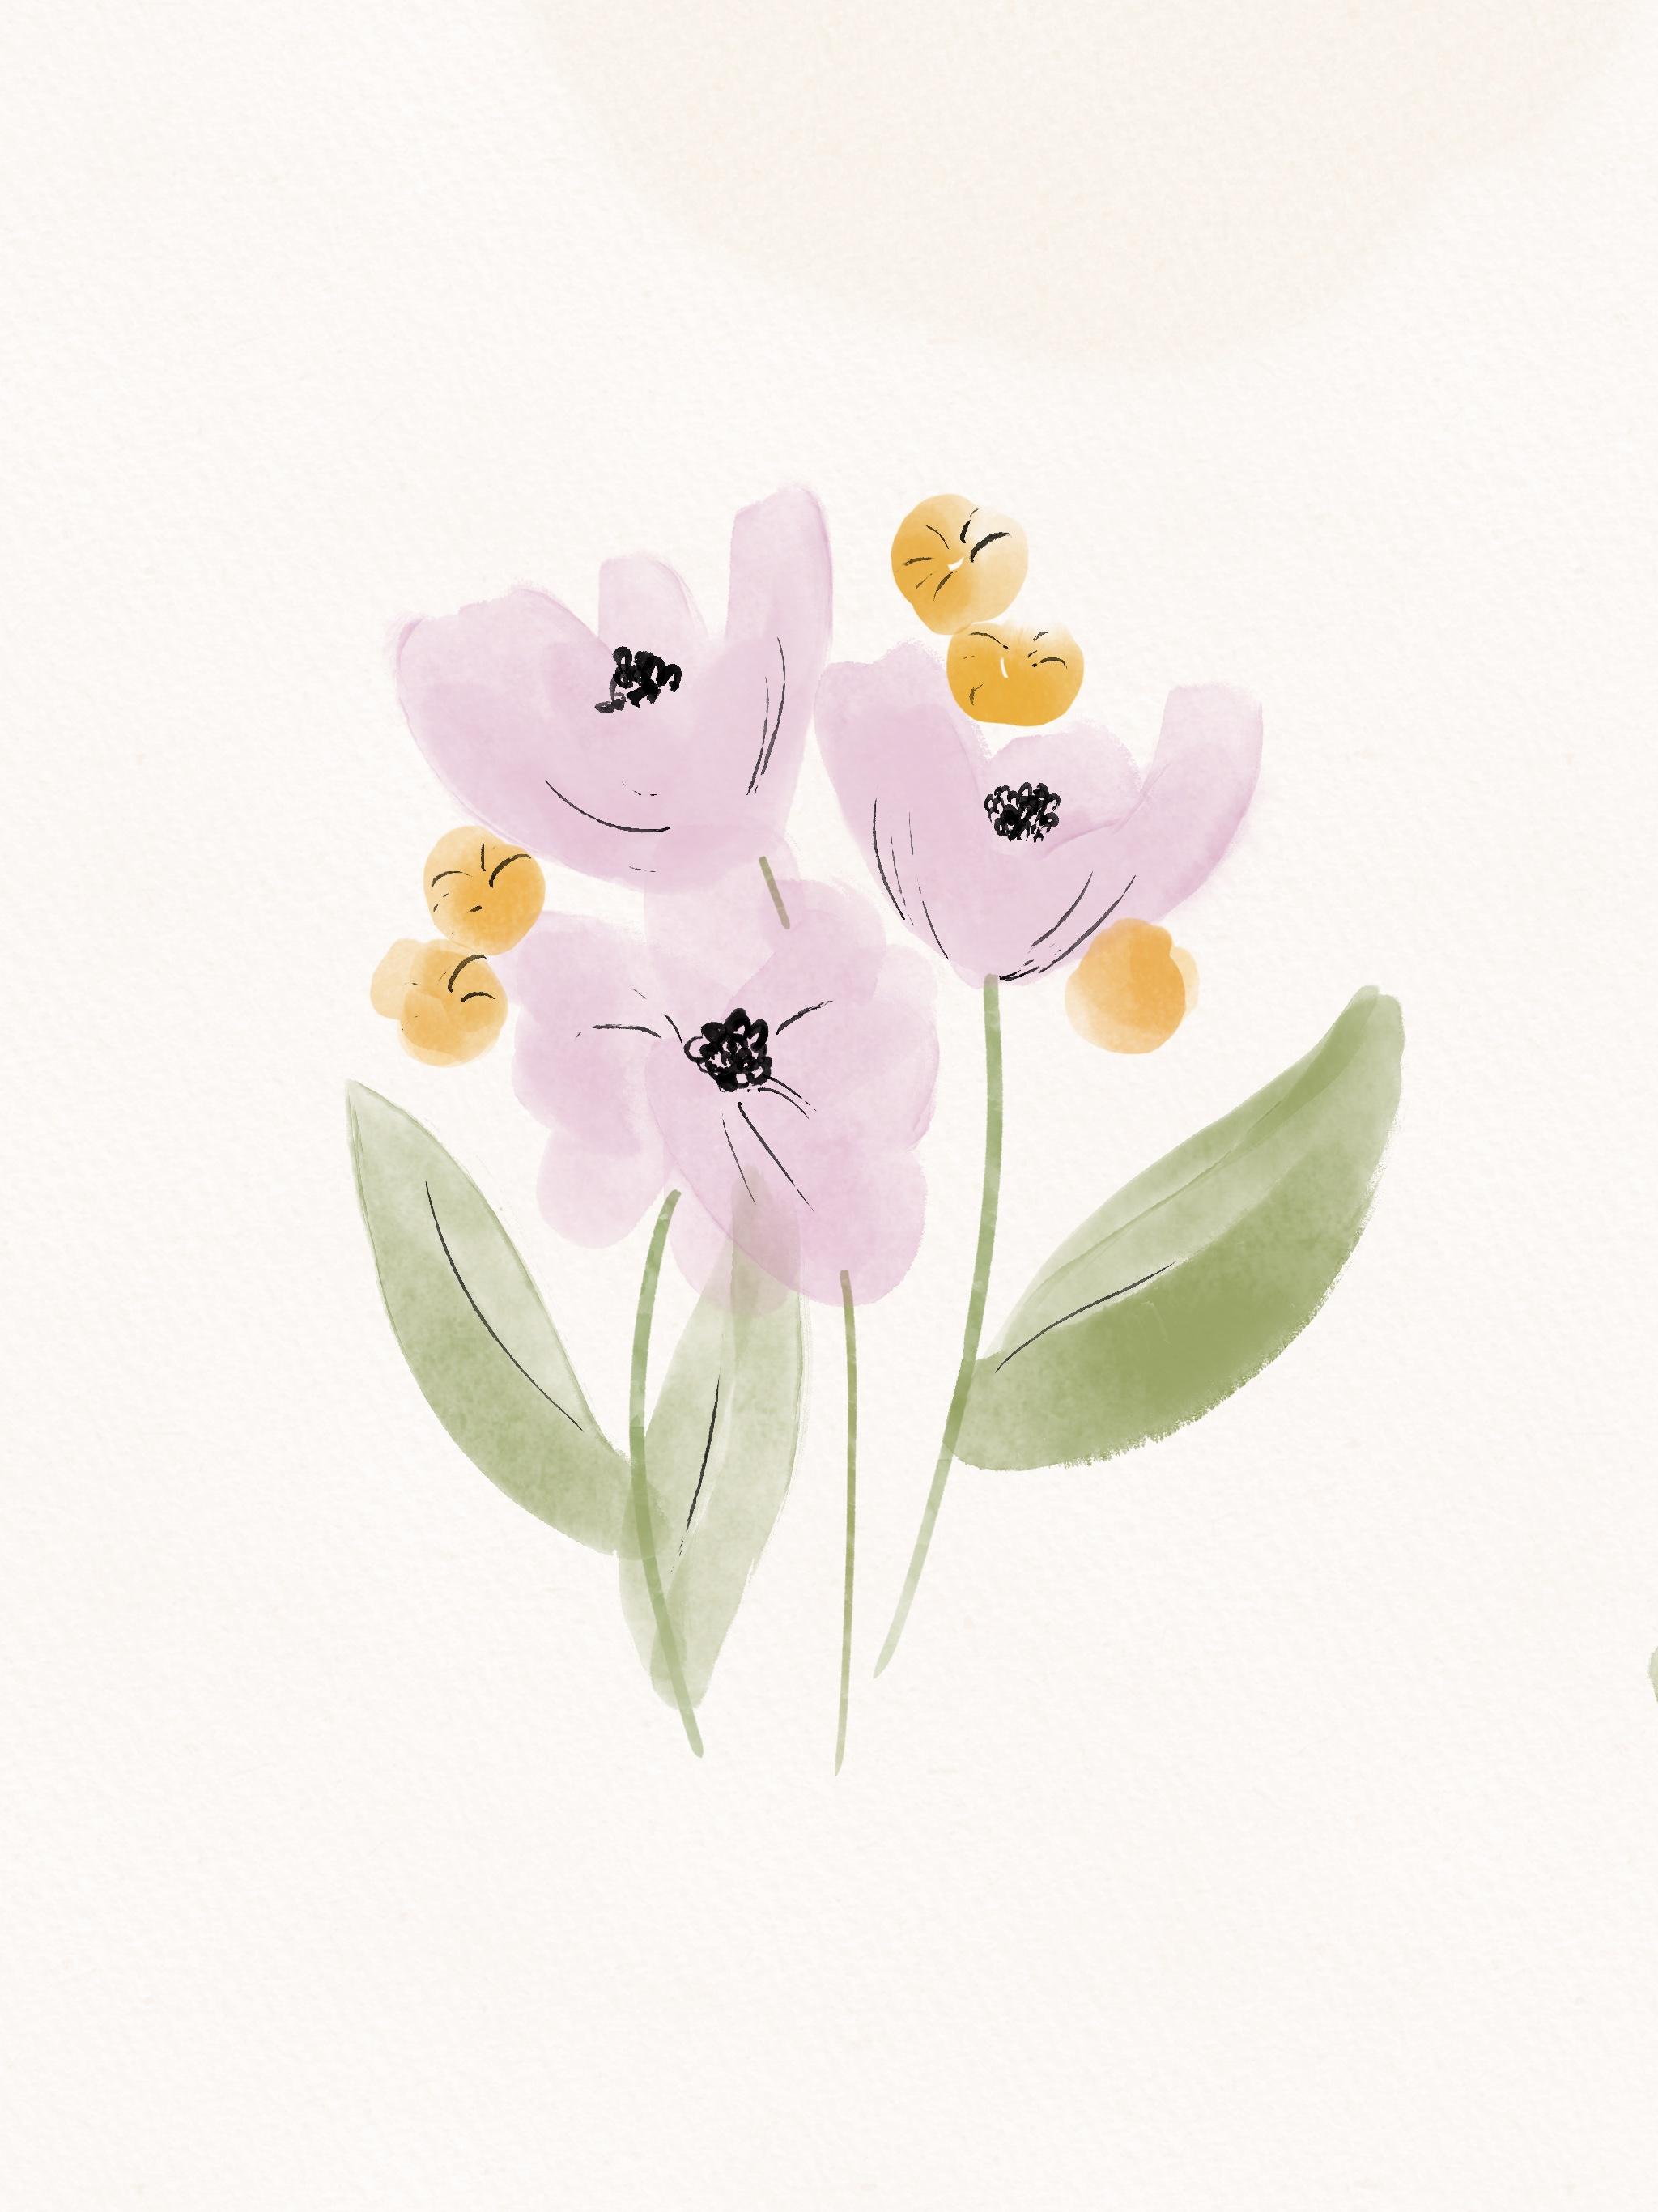 Create Realistic Watercolor Flowers In Procreate